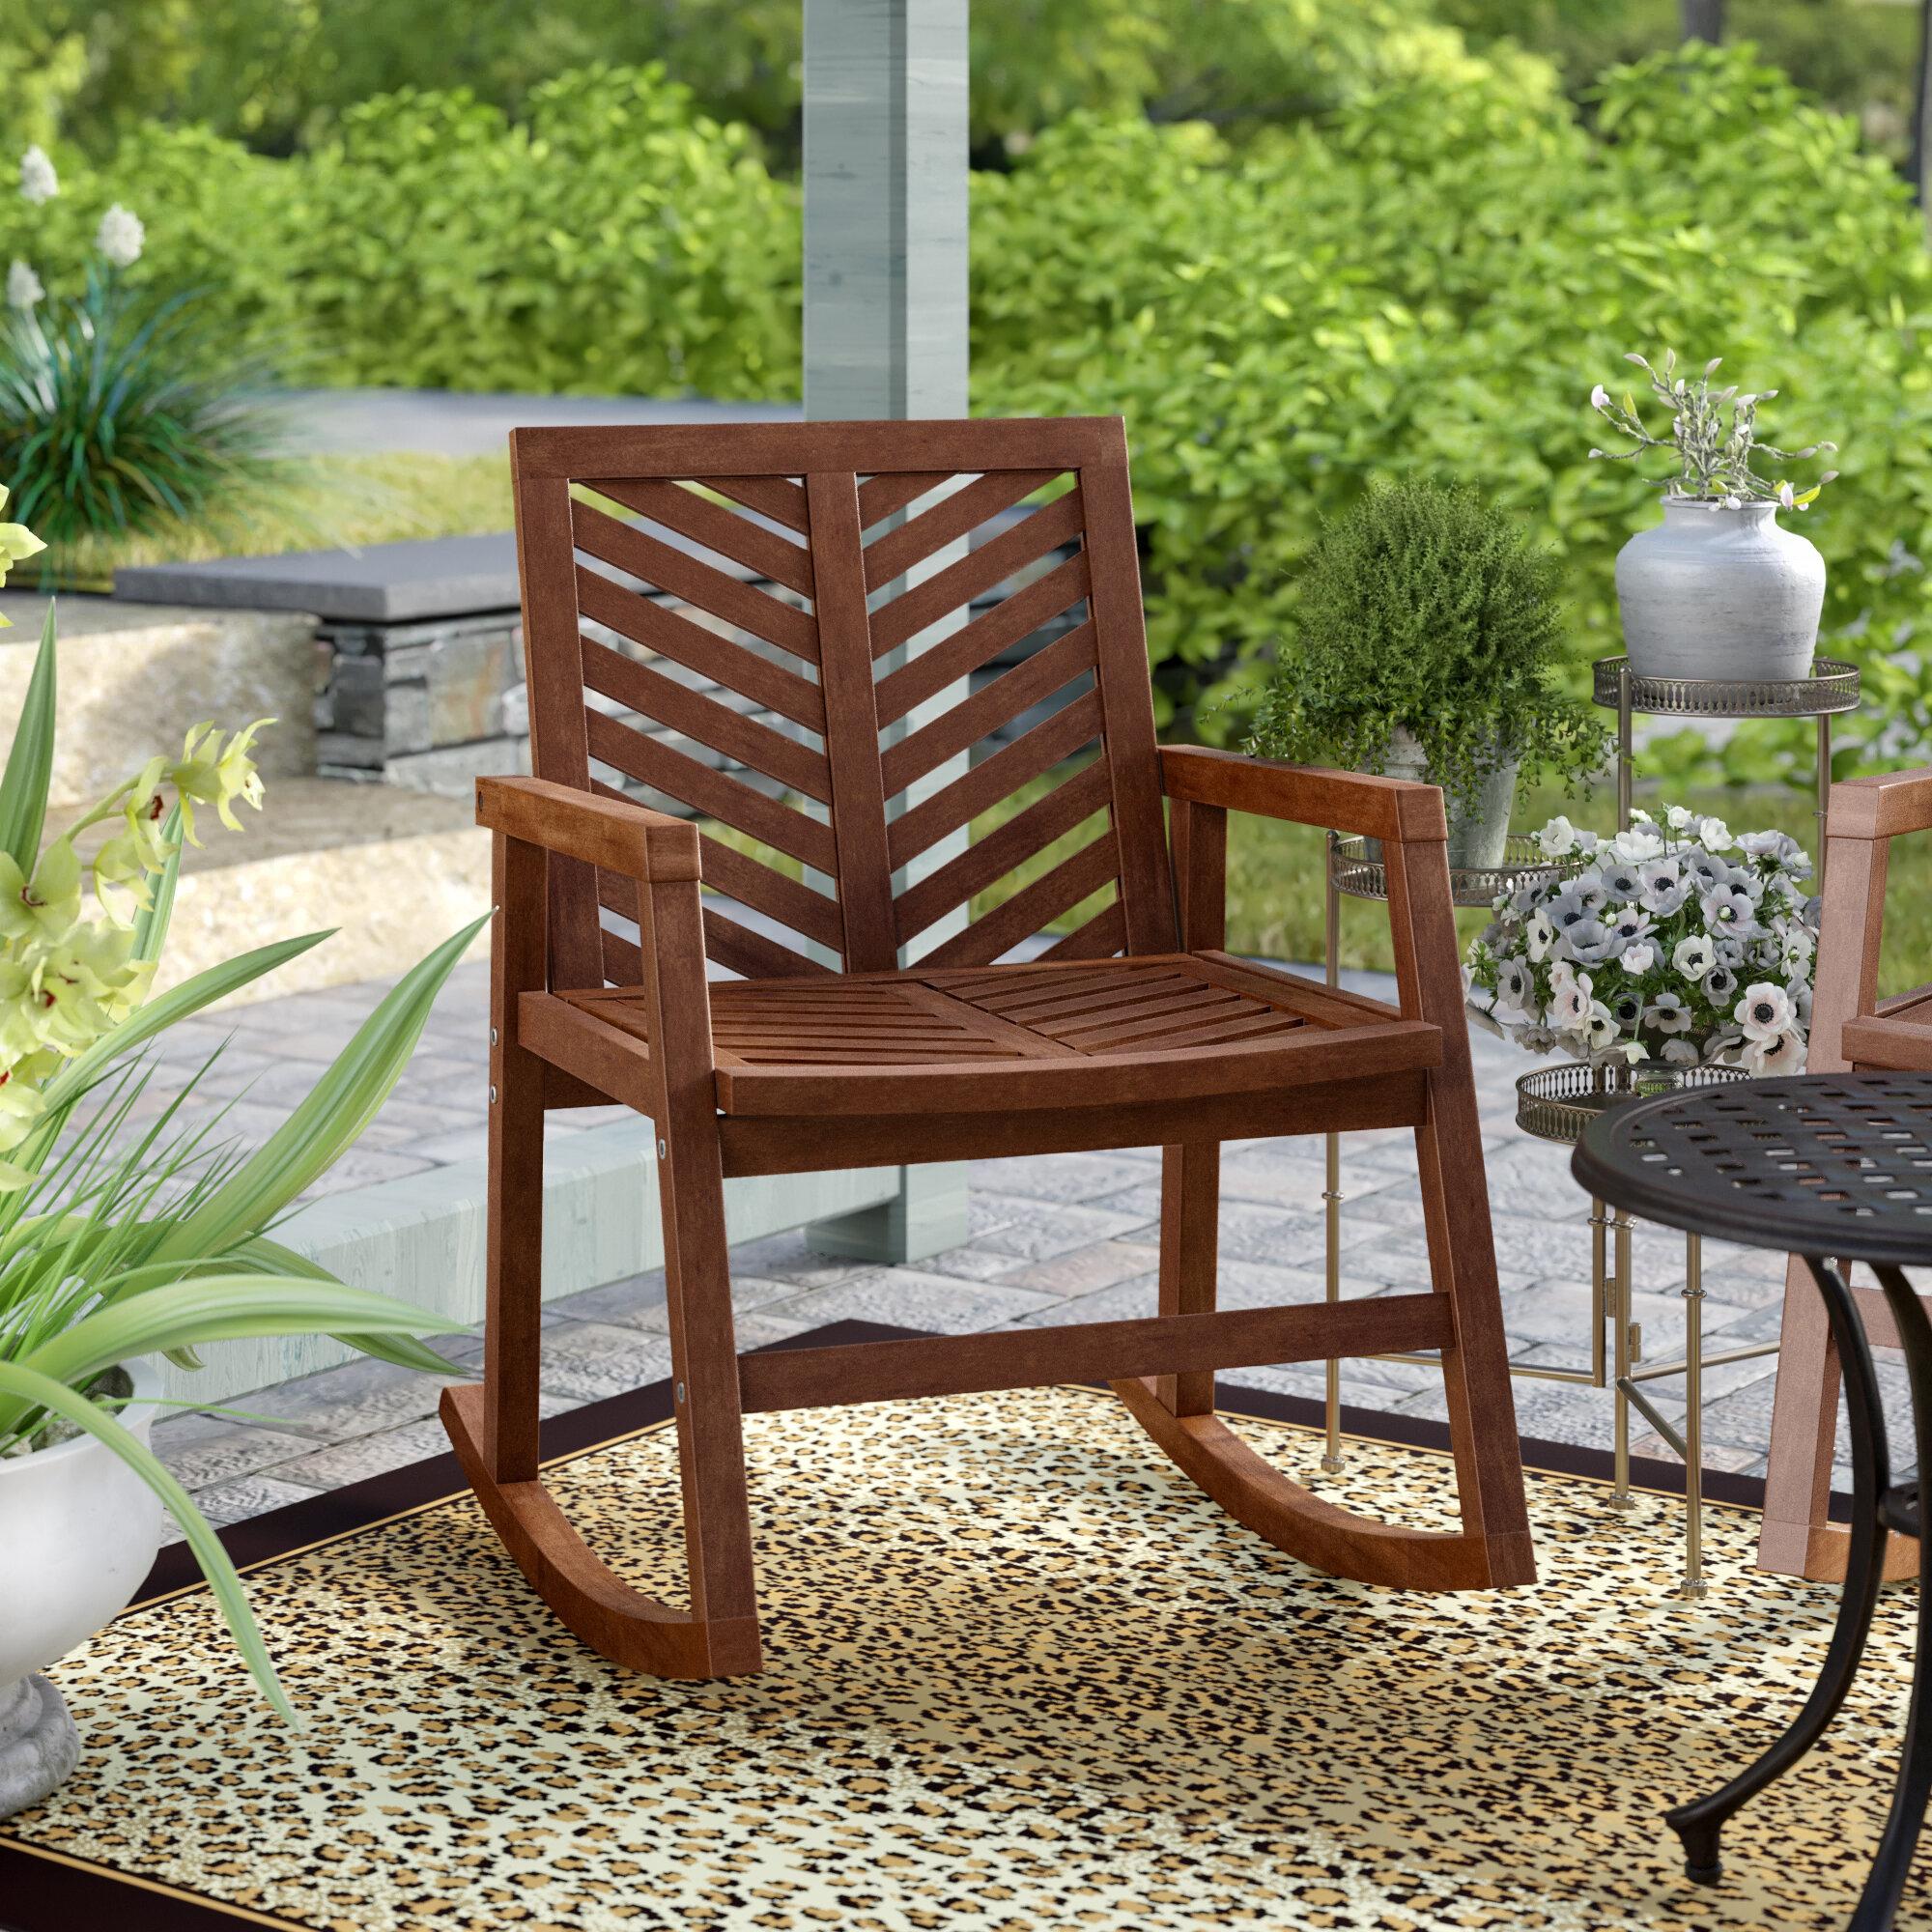 Skoog Outdoor Chevron Rocking Chair Intended For Skoog Chevron Wooden Garden Benches (View 17 of 25)